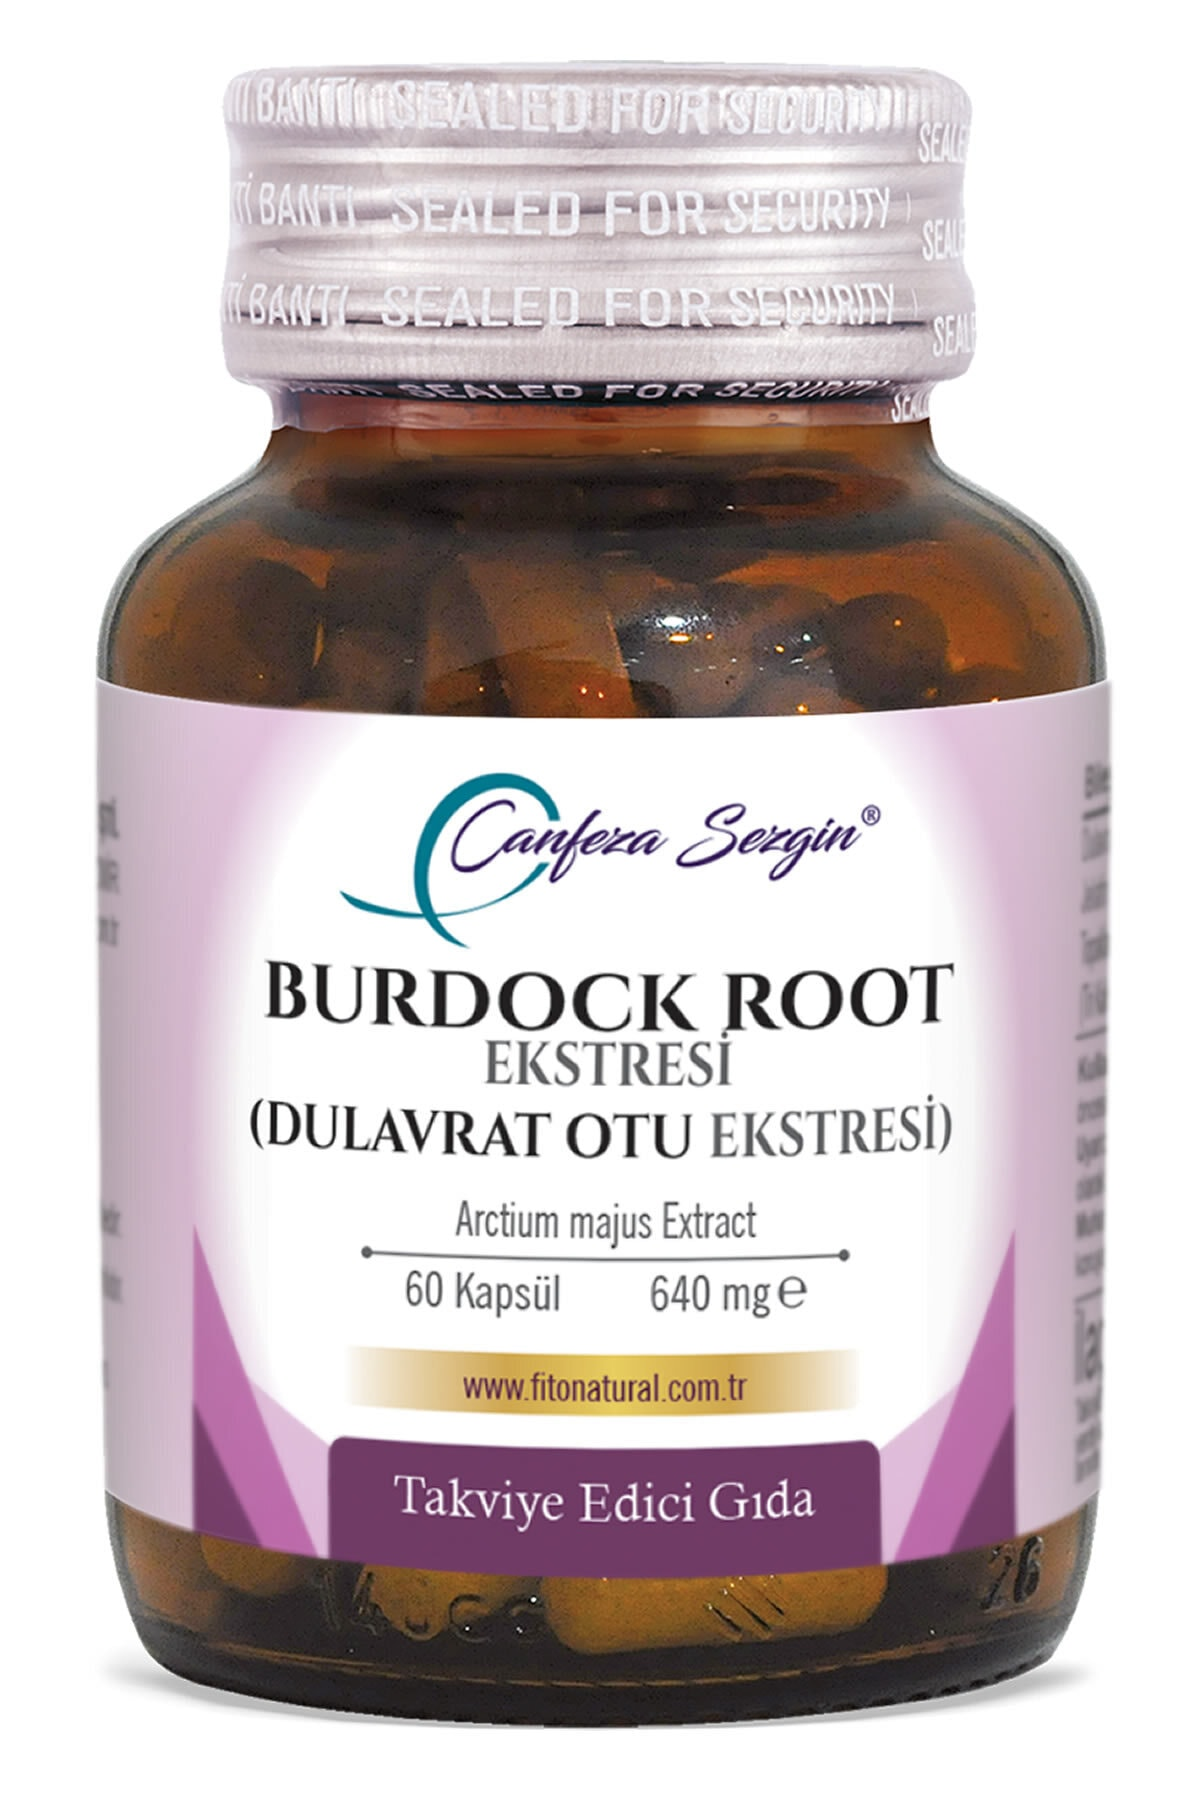 Burdock Root (dulavrat Otu) Ekstresi